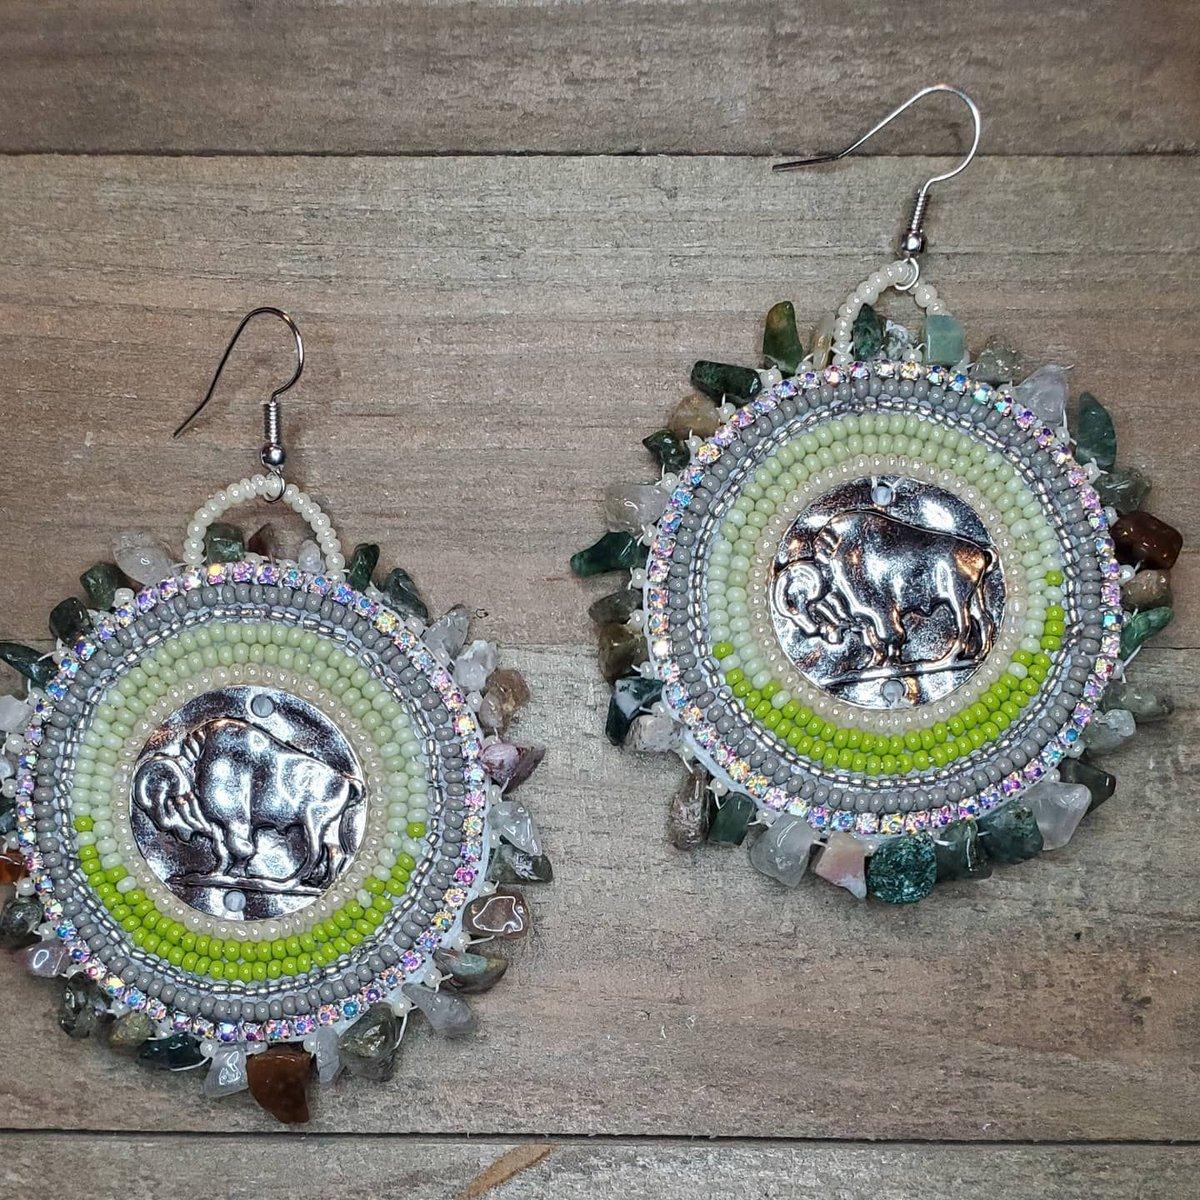 Wandering Buffalo beaded earrings with genuine jasper stones, FREE US shipping in my Etsy shop https://buff.ly/34tiaRC #NativeTwitter #AlaskaNative #FirstNations #Statimc #Unangax #Aleut #beadedearrings #beadwork #buynative #NativeMadepic.twitter.com/1OPsYgHchT